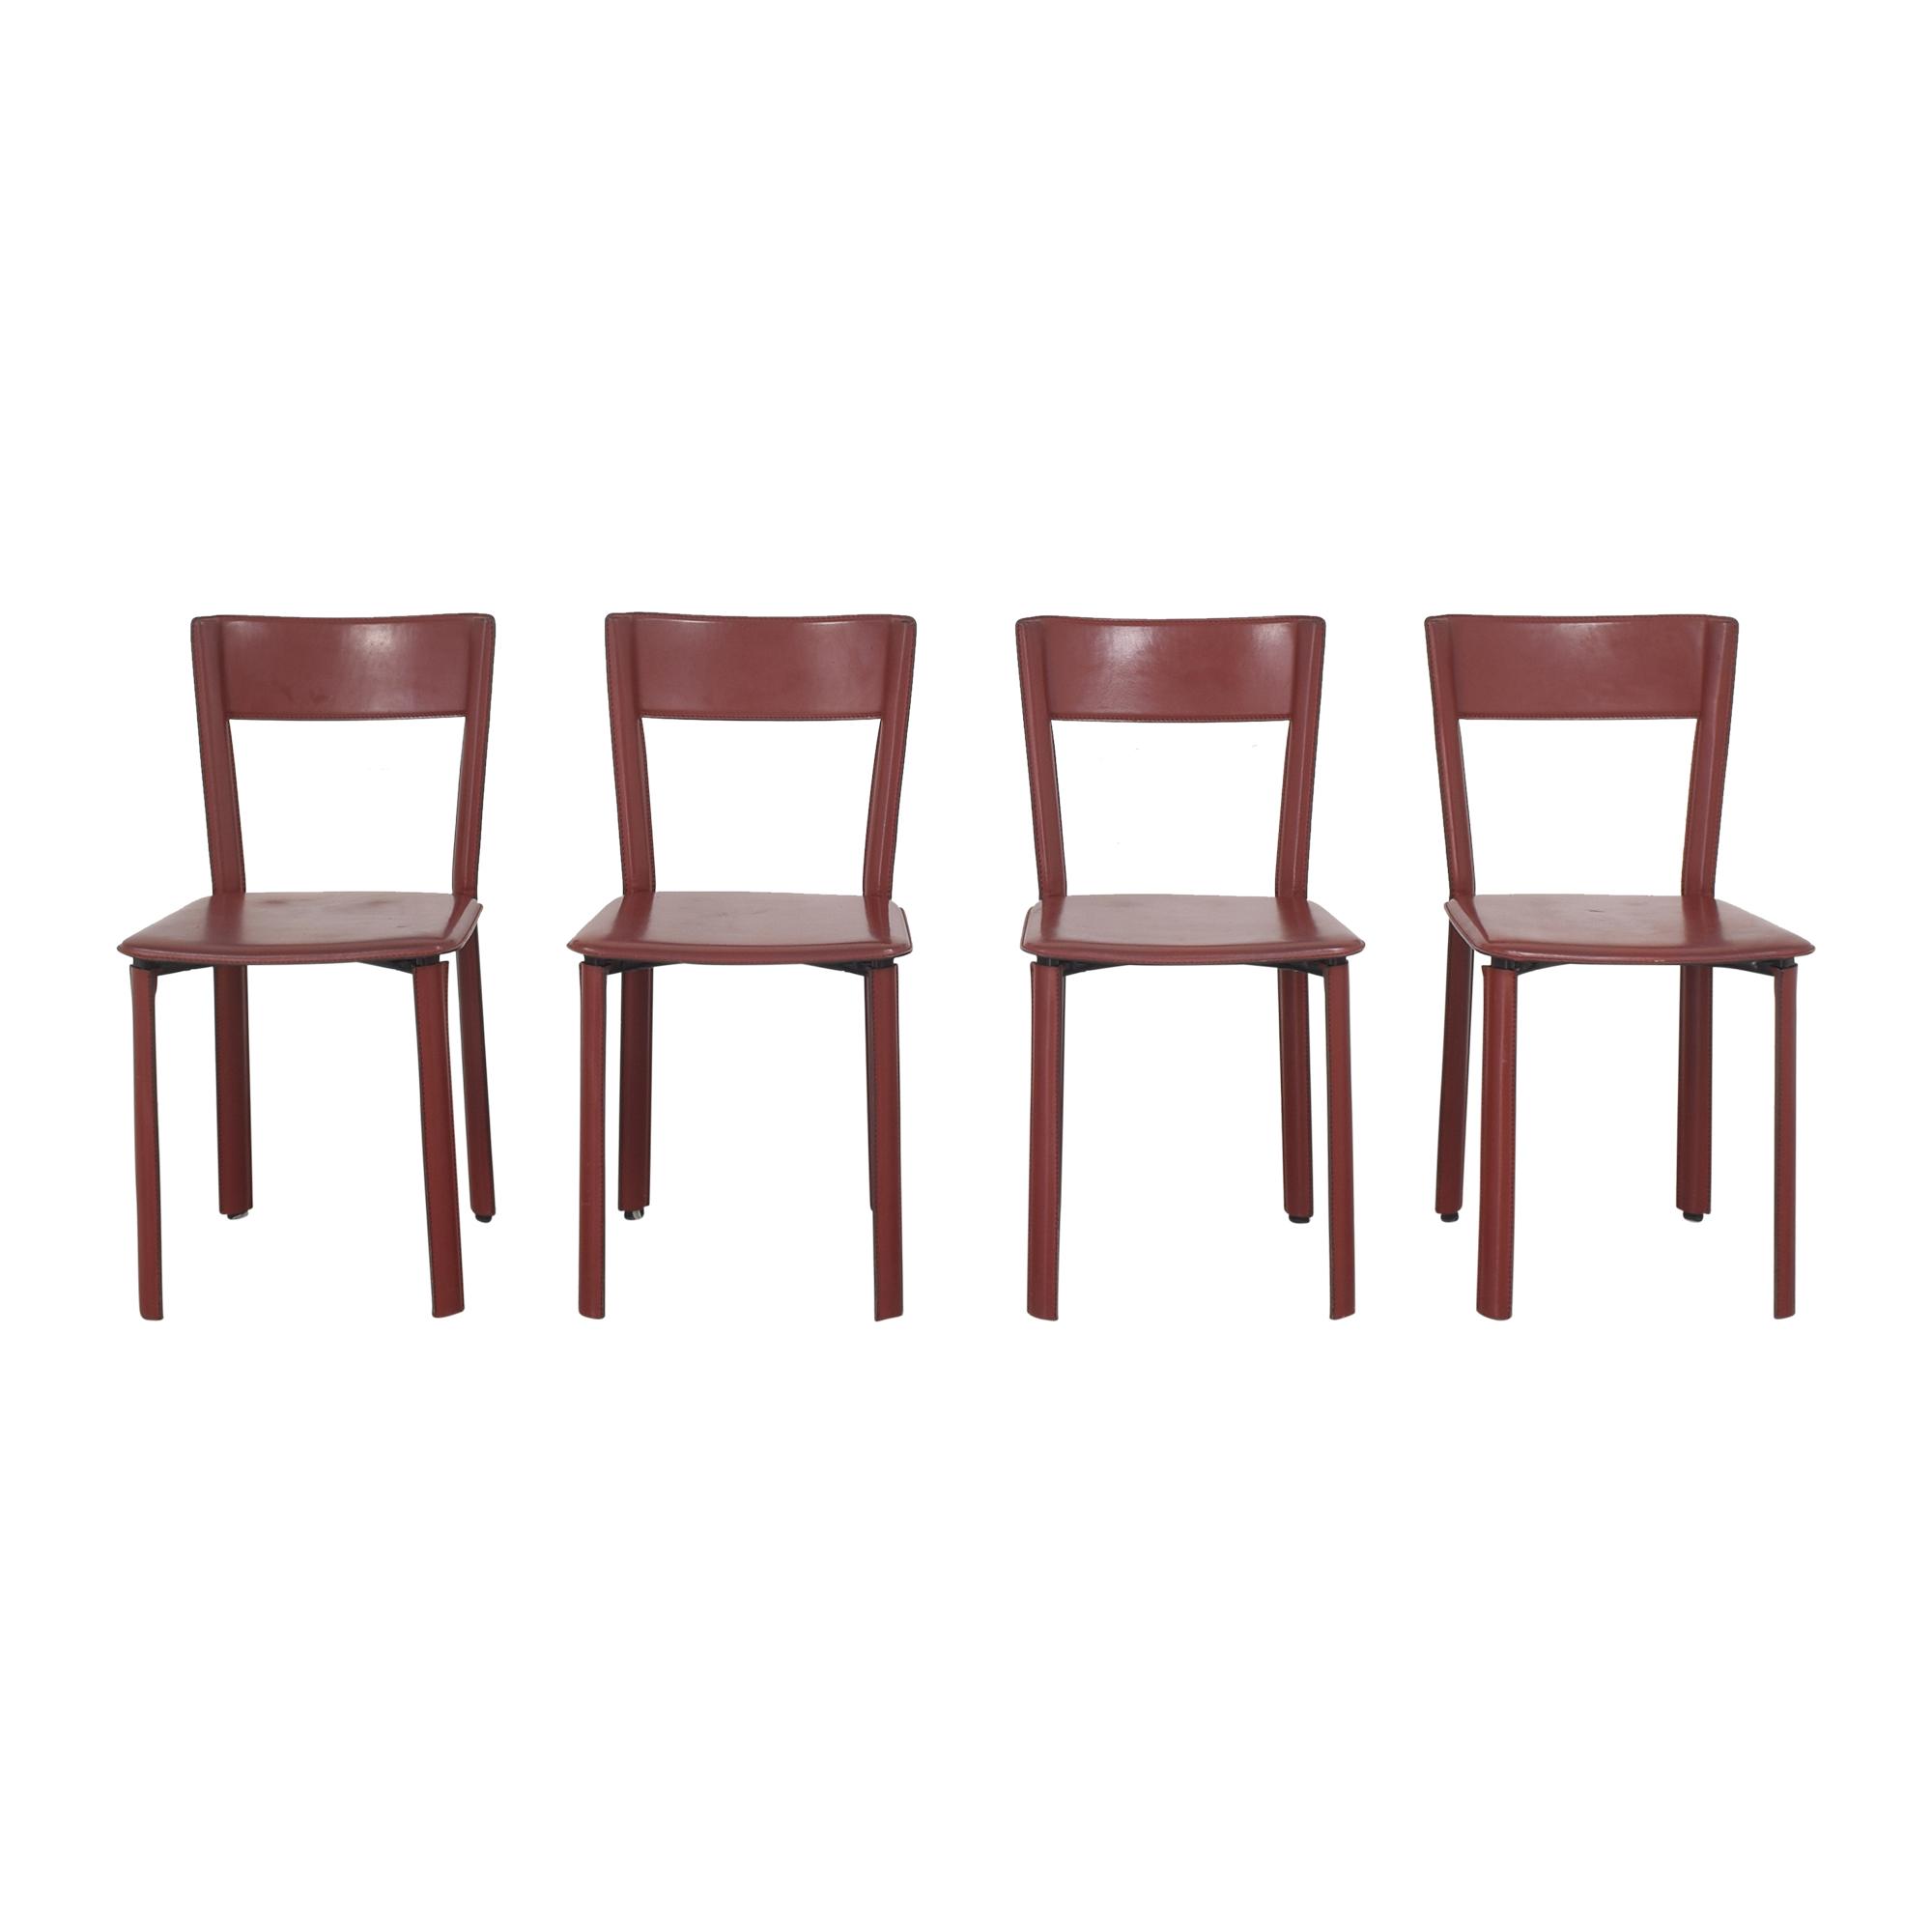 shop Design Within Reach Design Within Reach Allegro Dining Chairs online